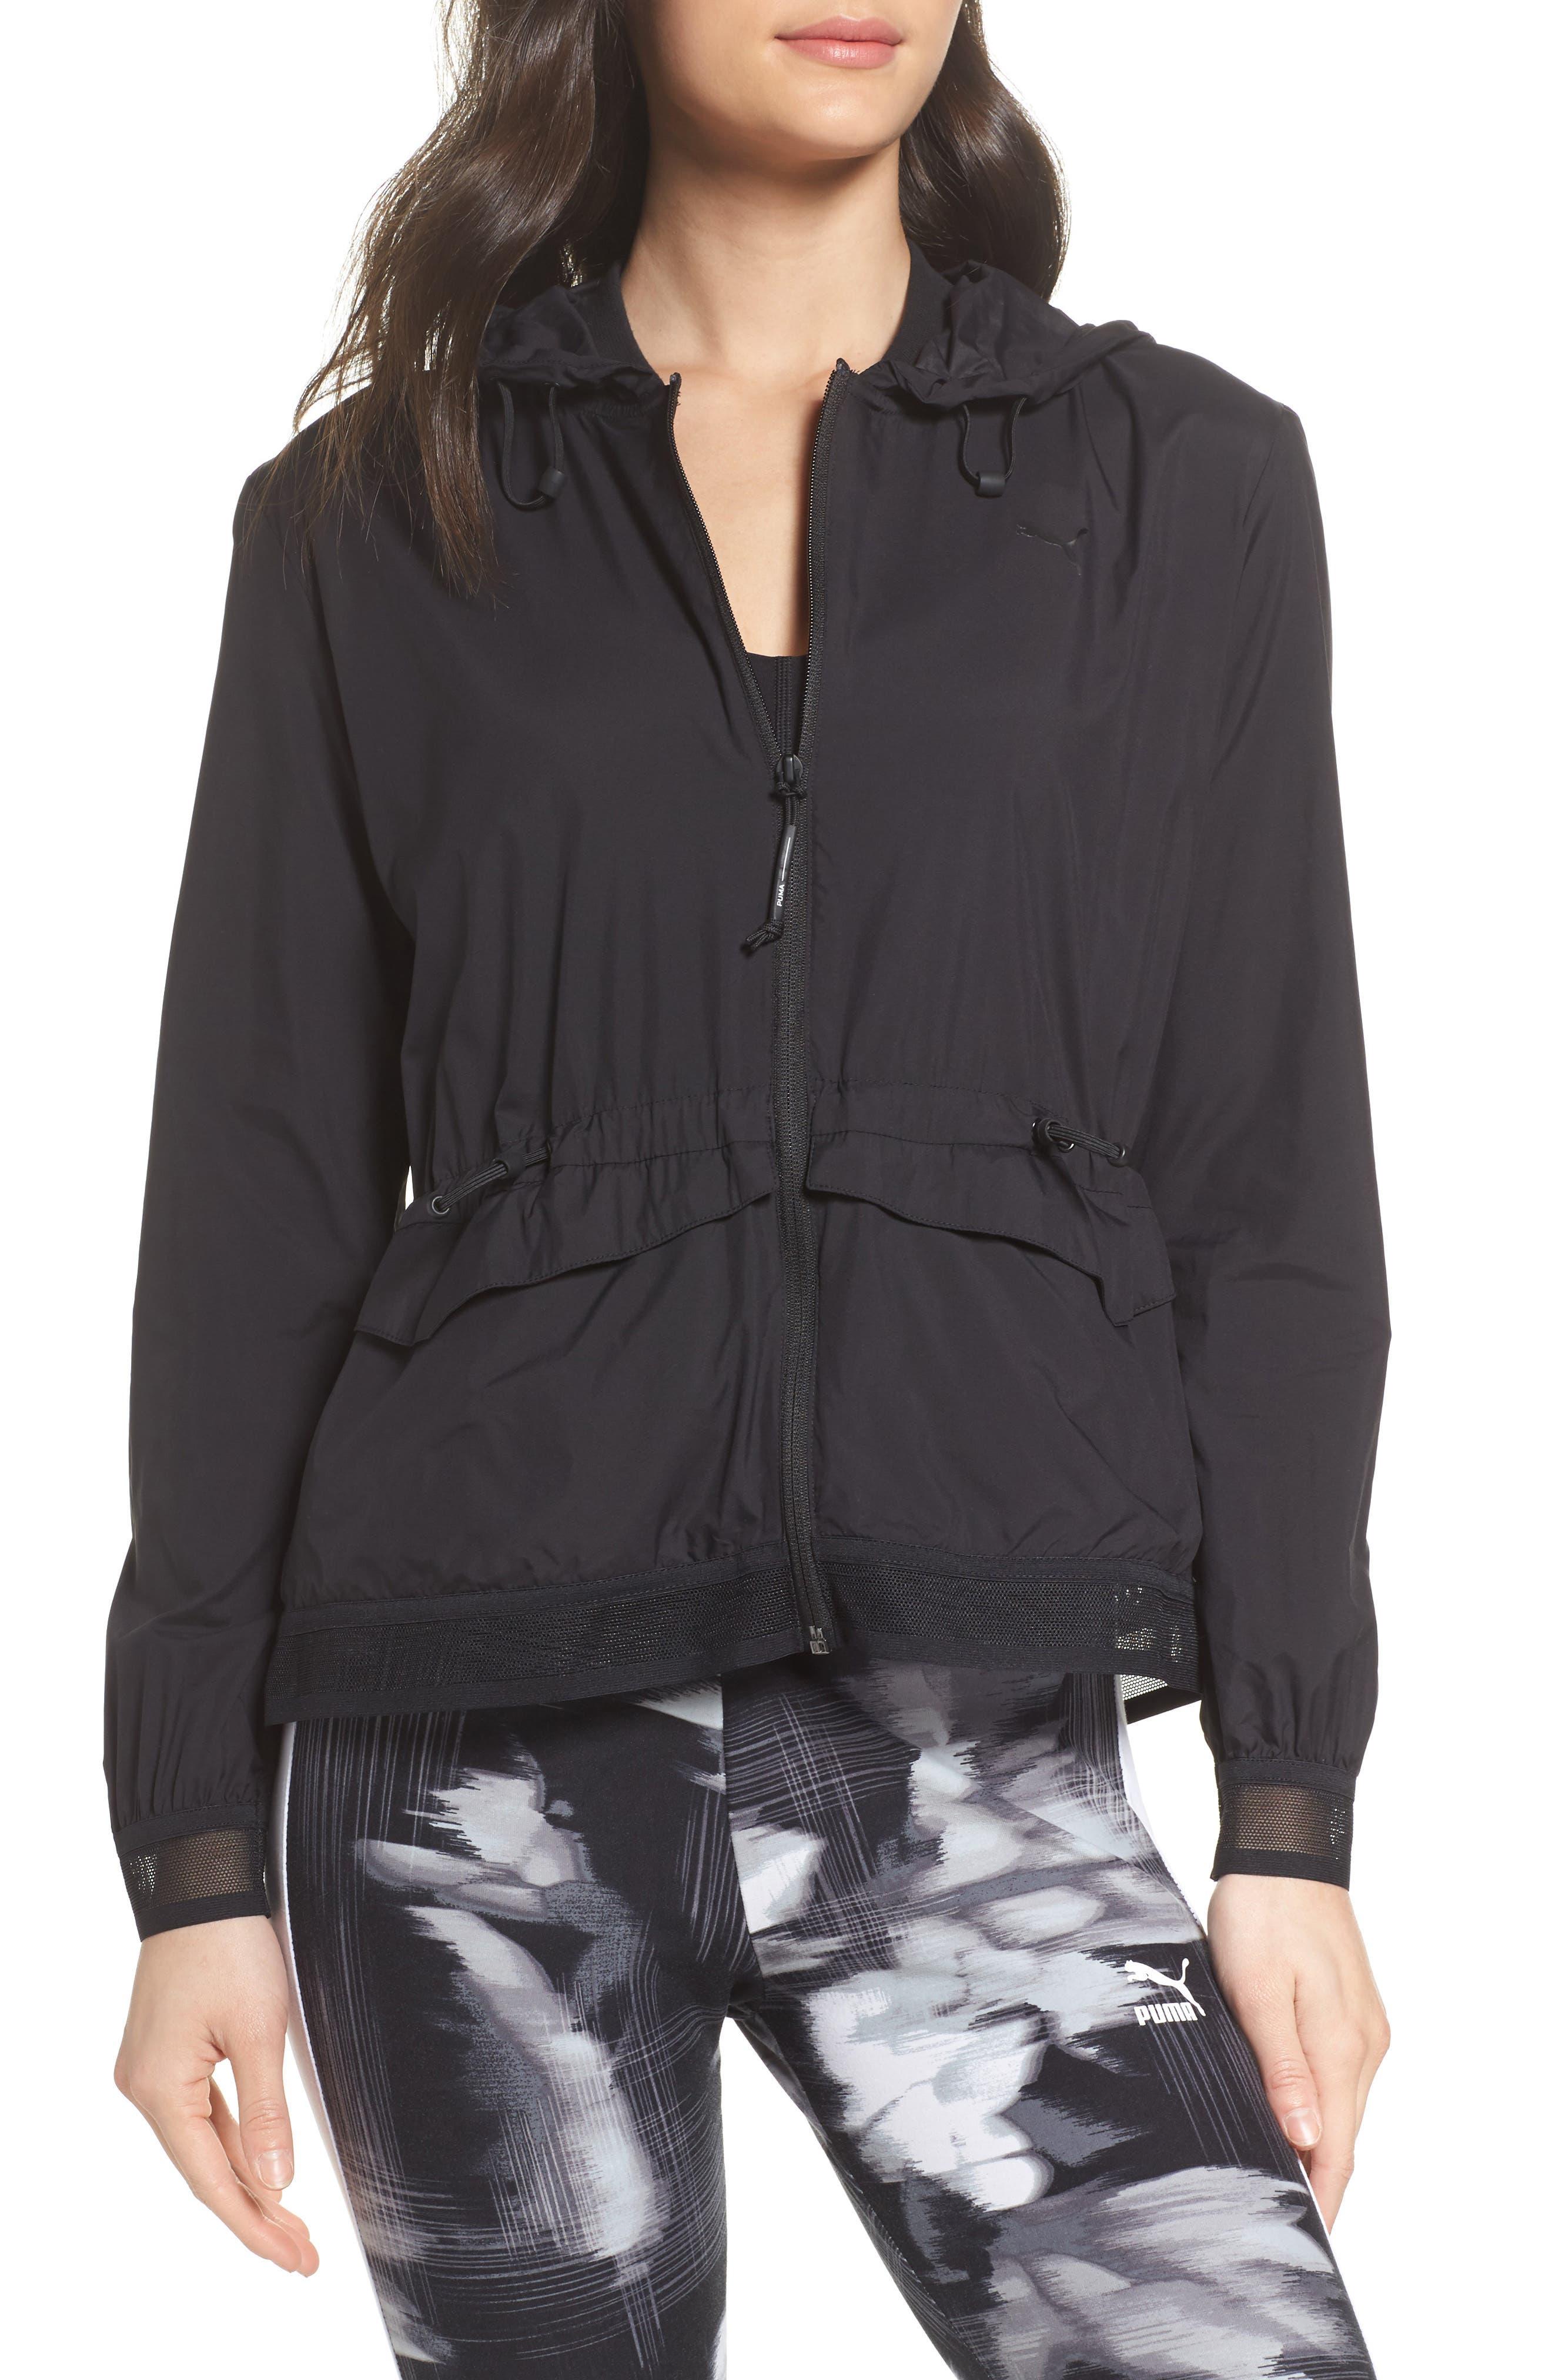 Alternate Image 1 Selected - Puma Evo Foldable Windrunner Jacket